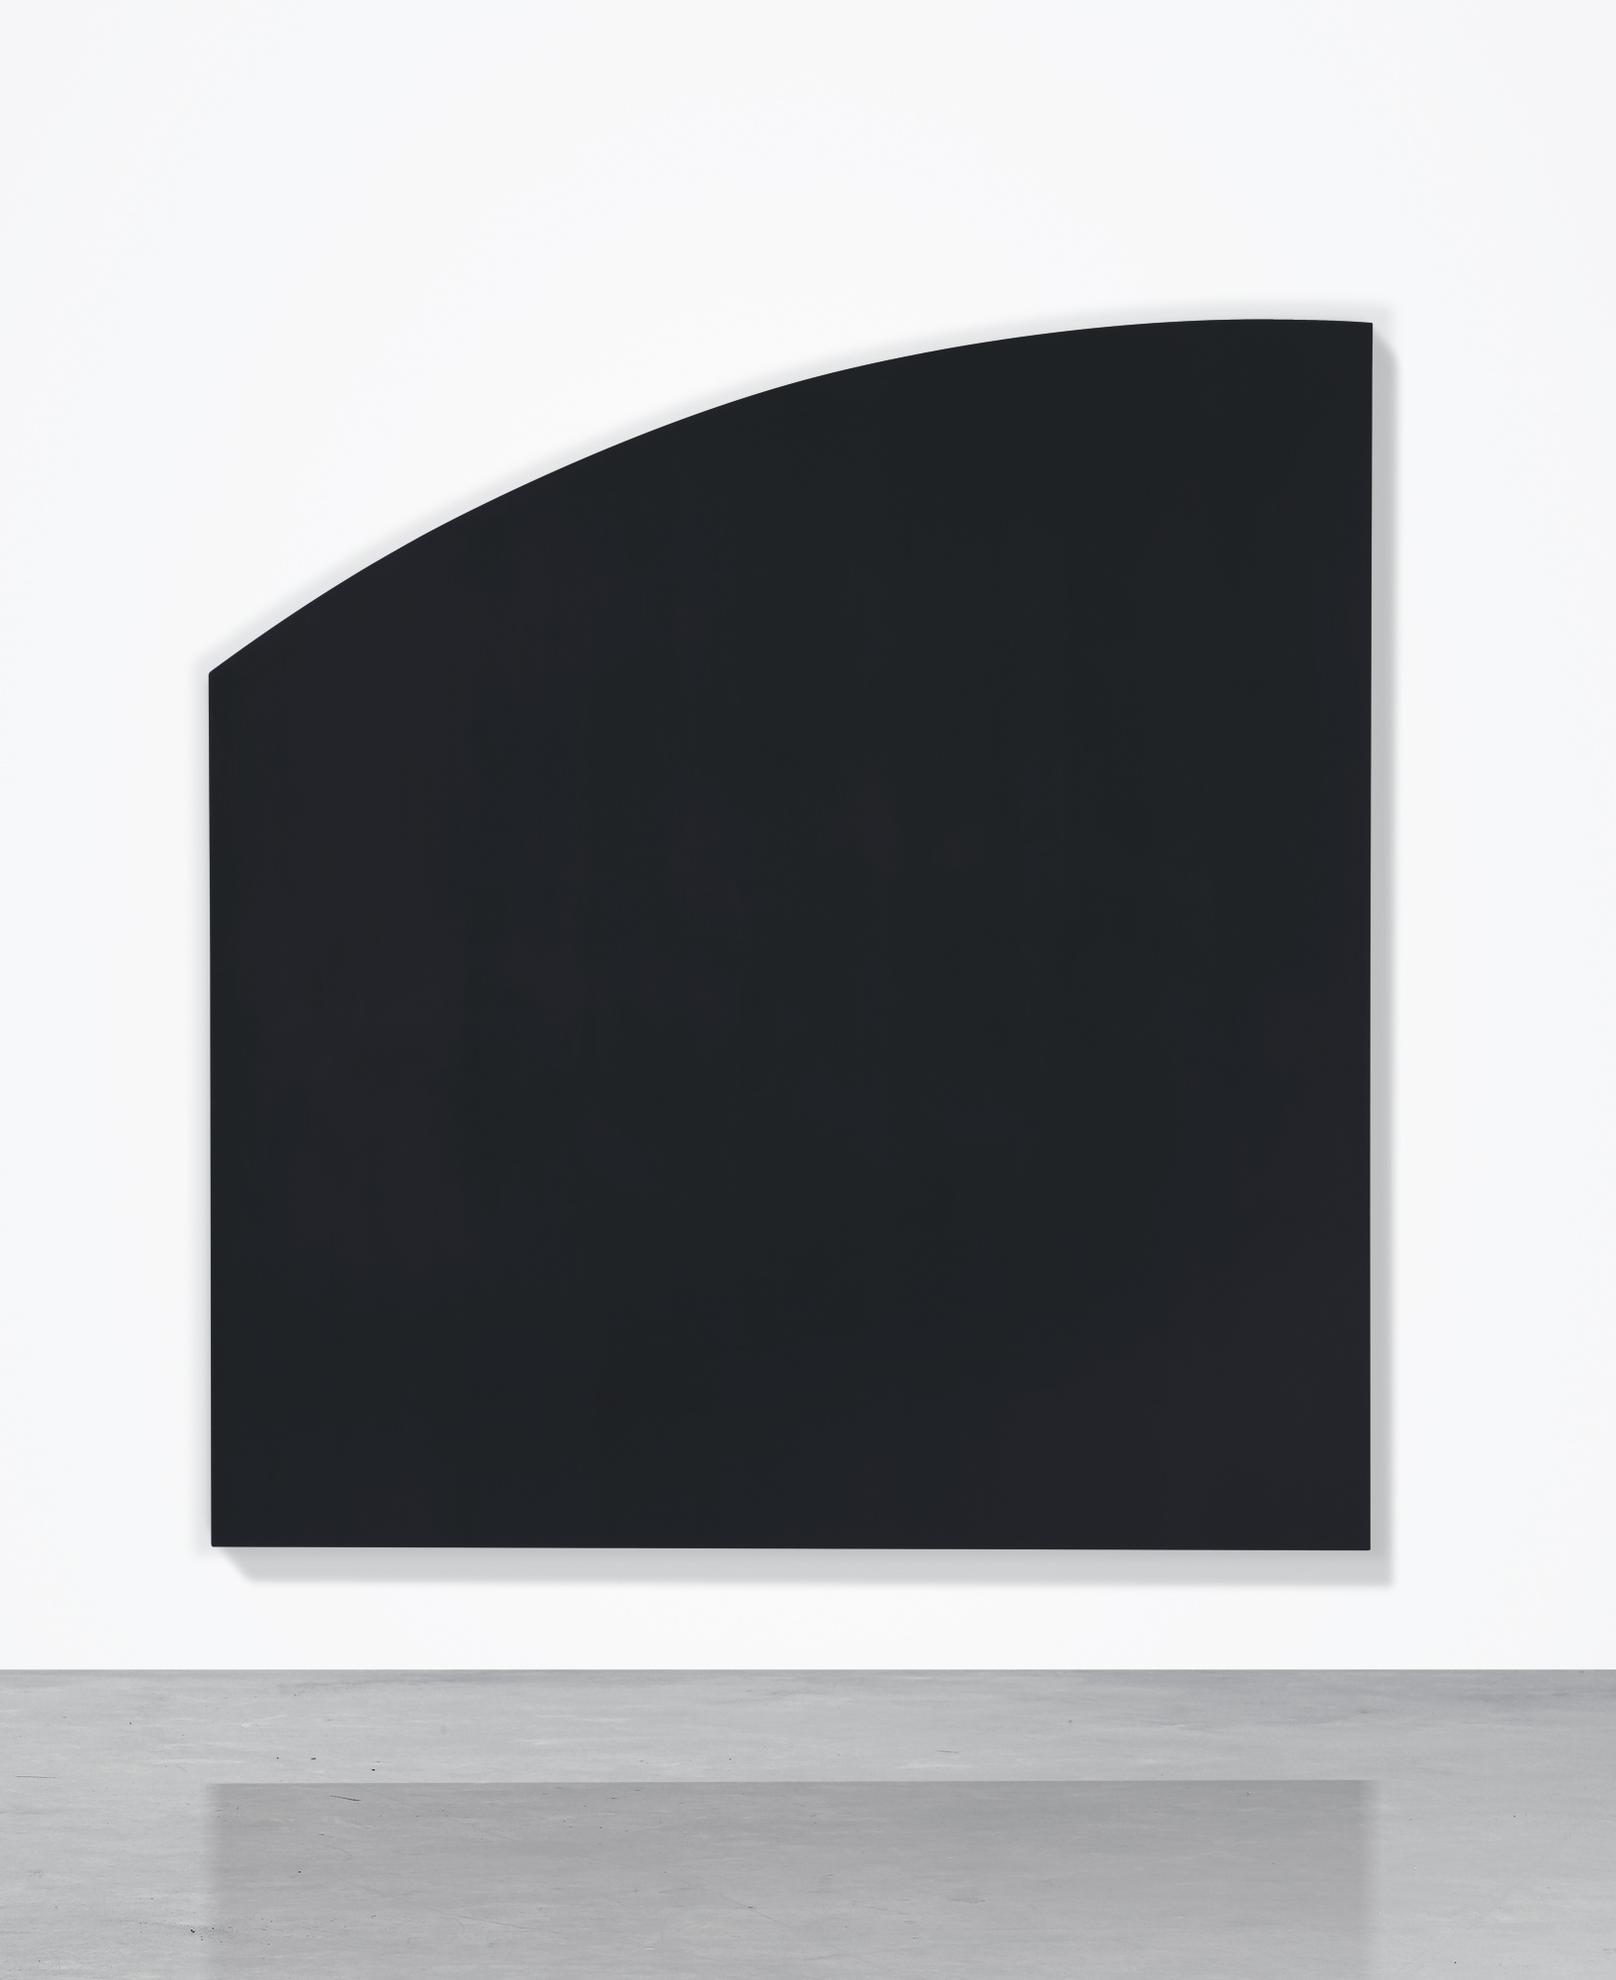 Ellsworth Kelly-Black Panel With Curve-1999